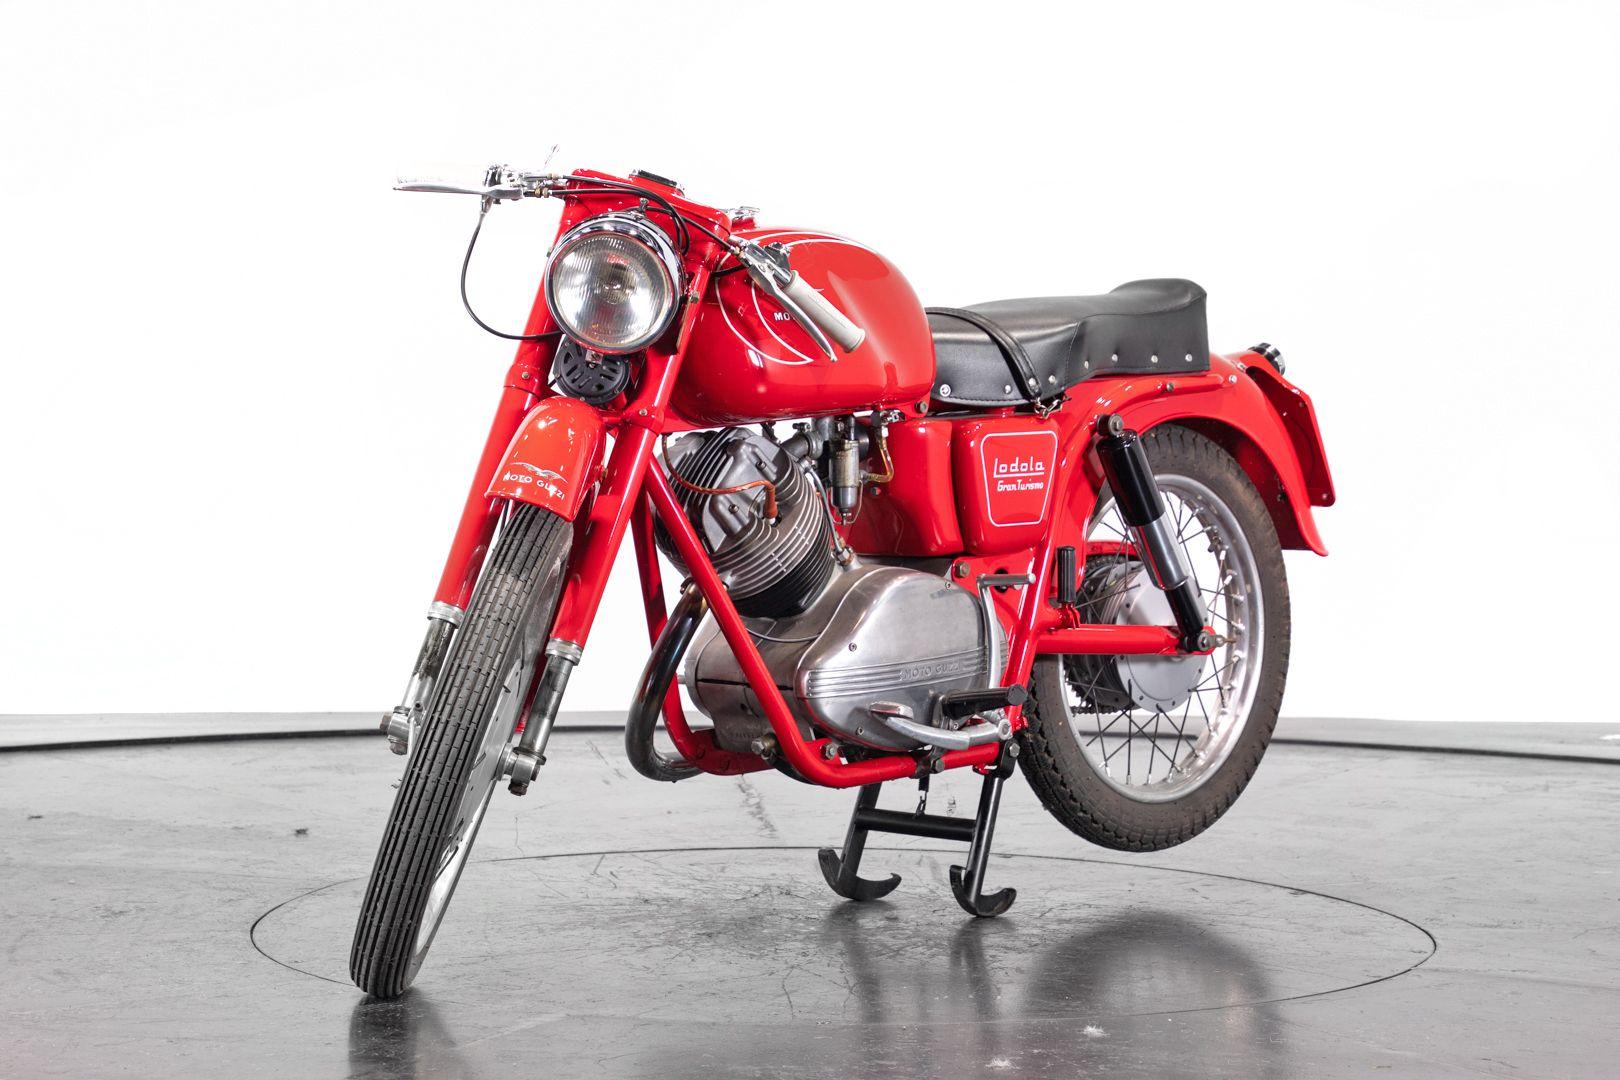 1959 Moto Guzzi Lodola 235 GT 41882